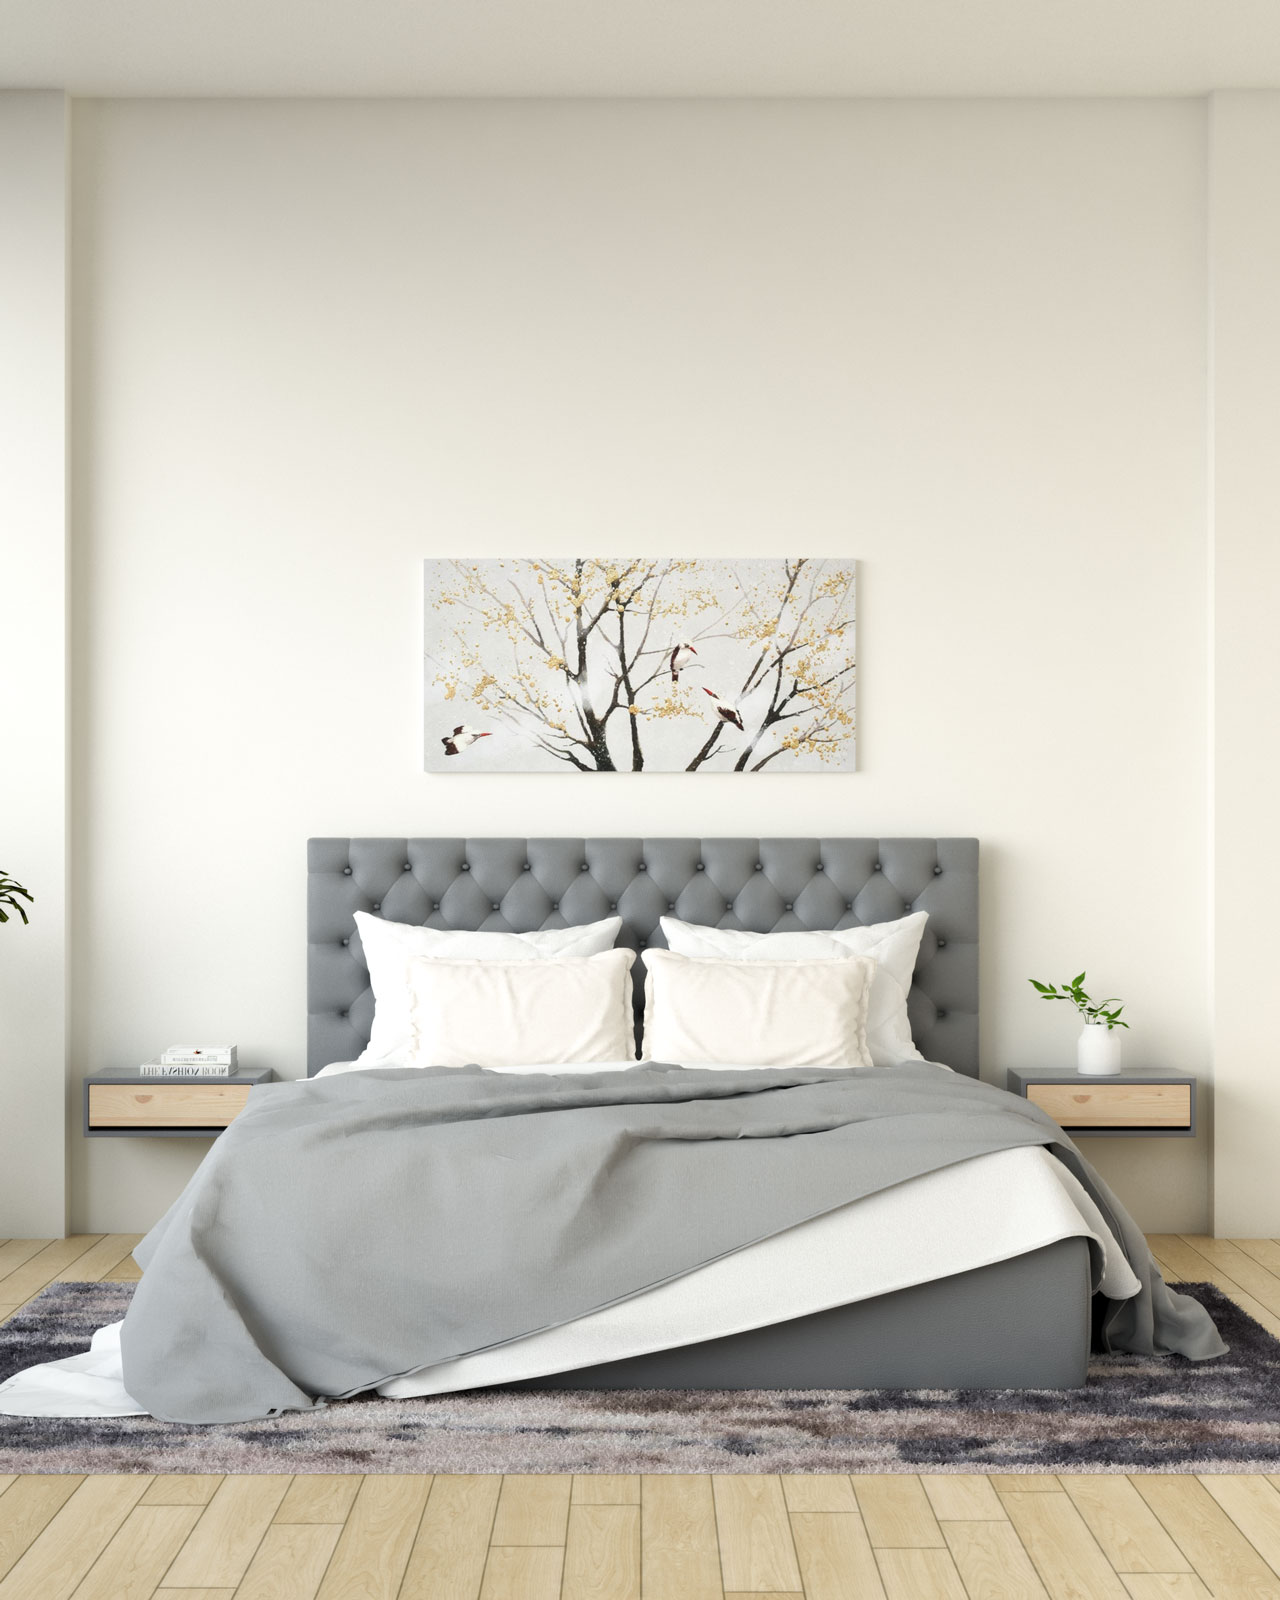 Cream walls behind gray bed